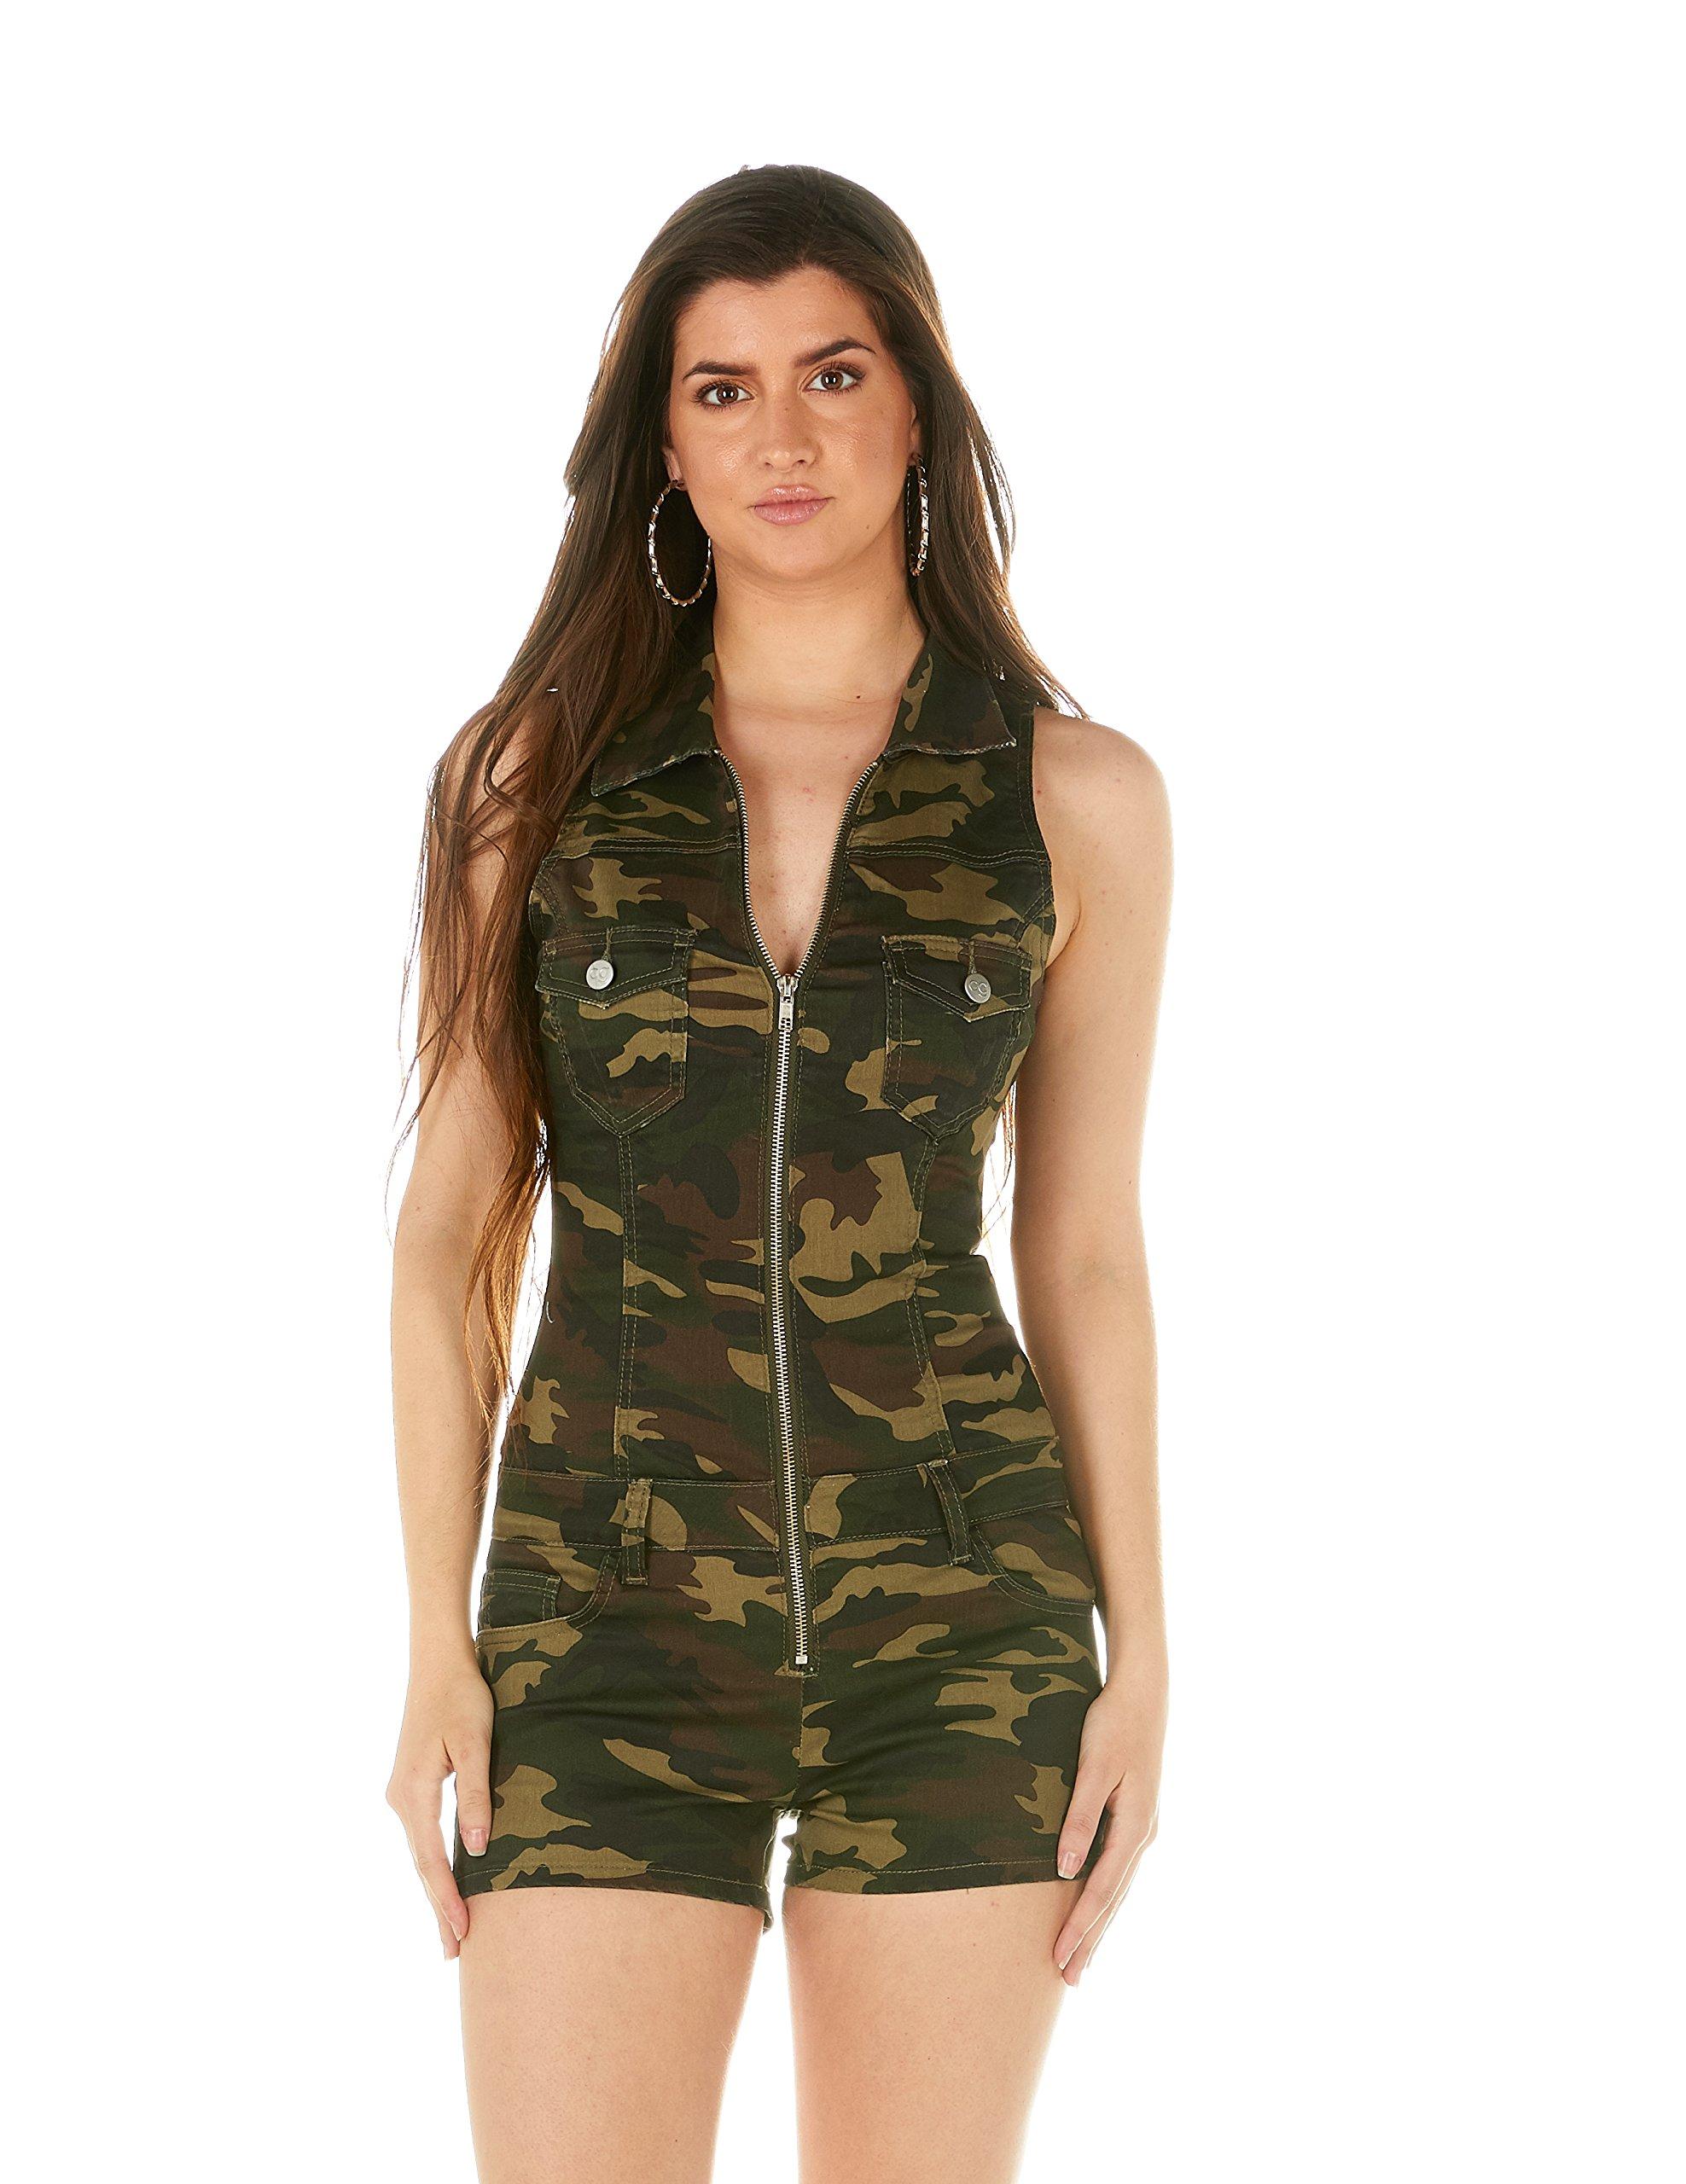 V.I.P. JEANS Women's Size Slim Fit Sleeveless Denim Romper Shorts Zip Up, Green Camo, Plus (XXL) by V.I.P. JEANS